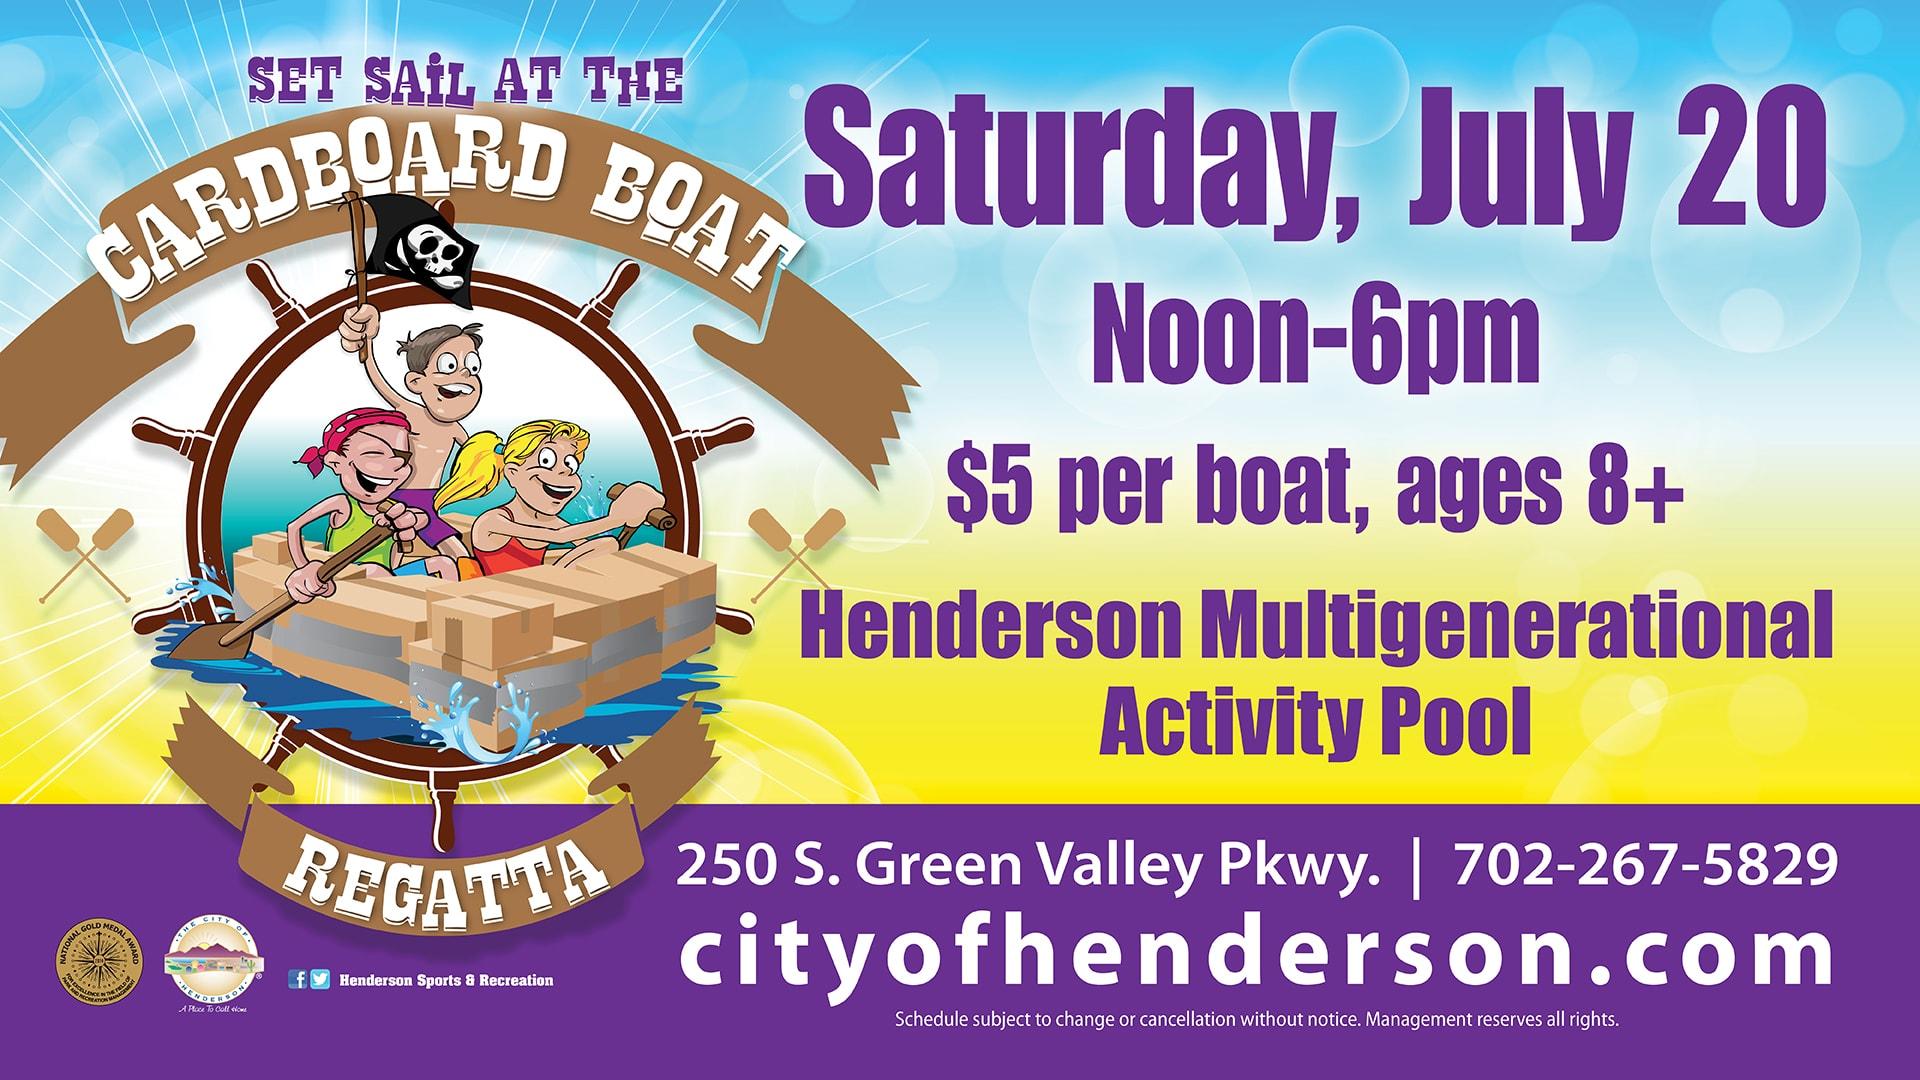 City of Henderson cardboard boat regatta